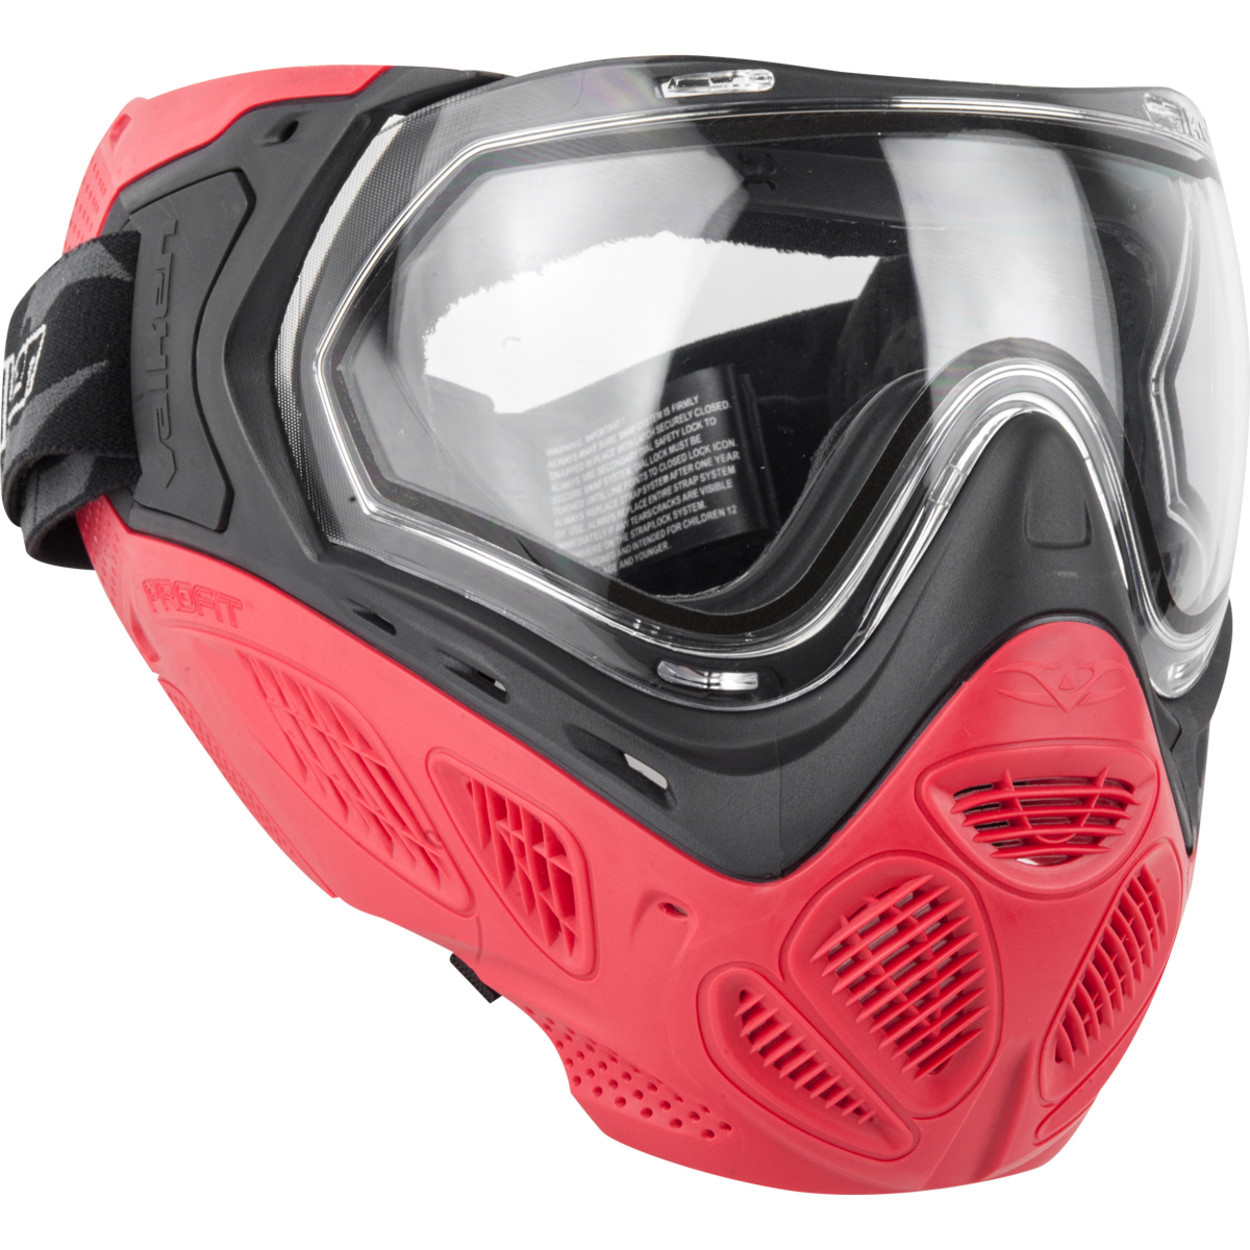 Valken Sly Profit SC Goggle Masque thermique - RD